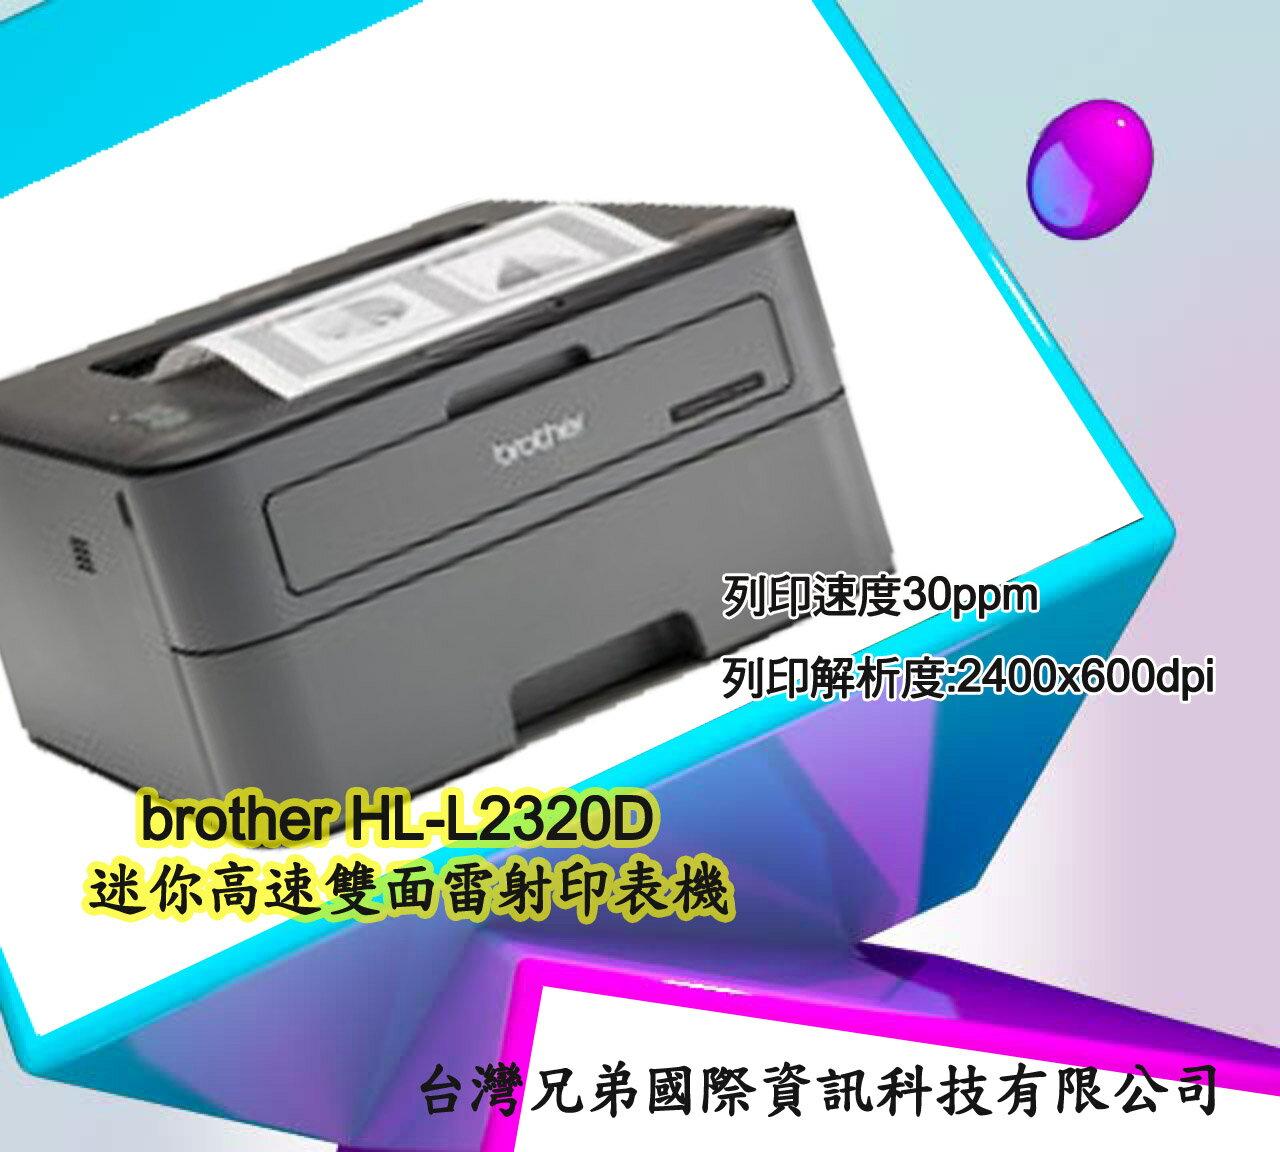 brother HL-L2320D 高速迷你雙面列印印表機(最新款)